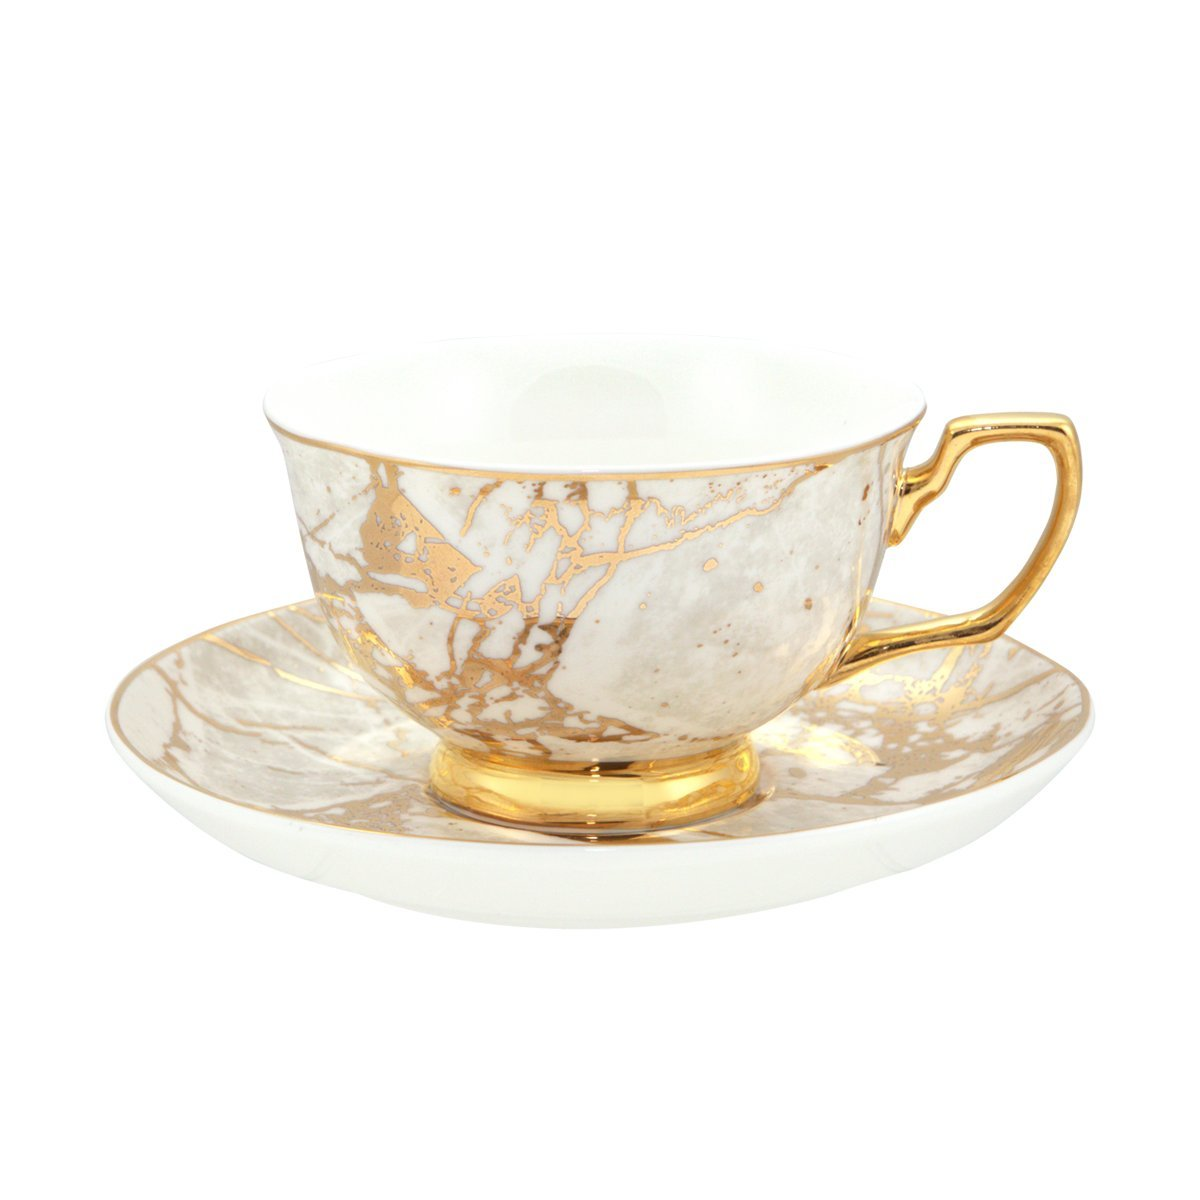 Cristina Re Teacup & Saucer White/Gold Celestite